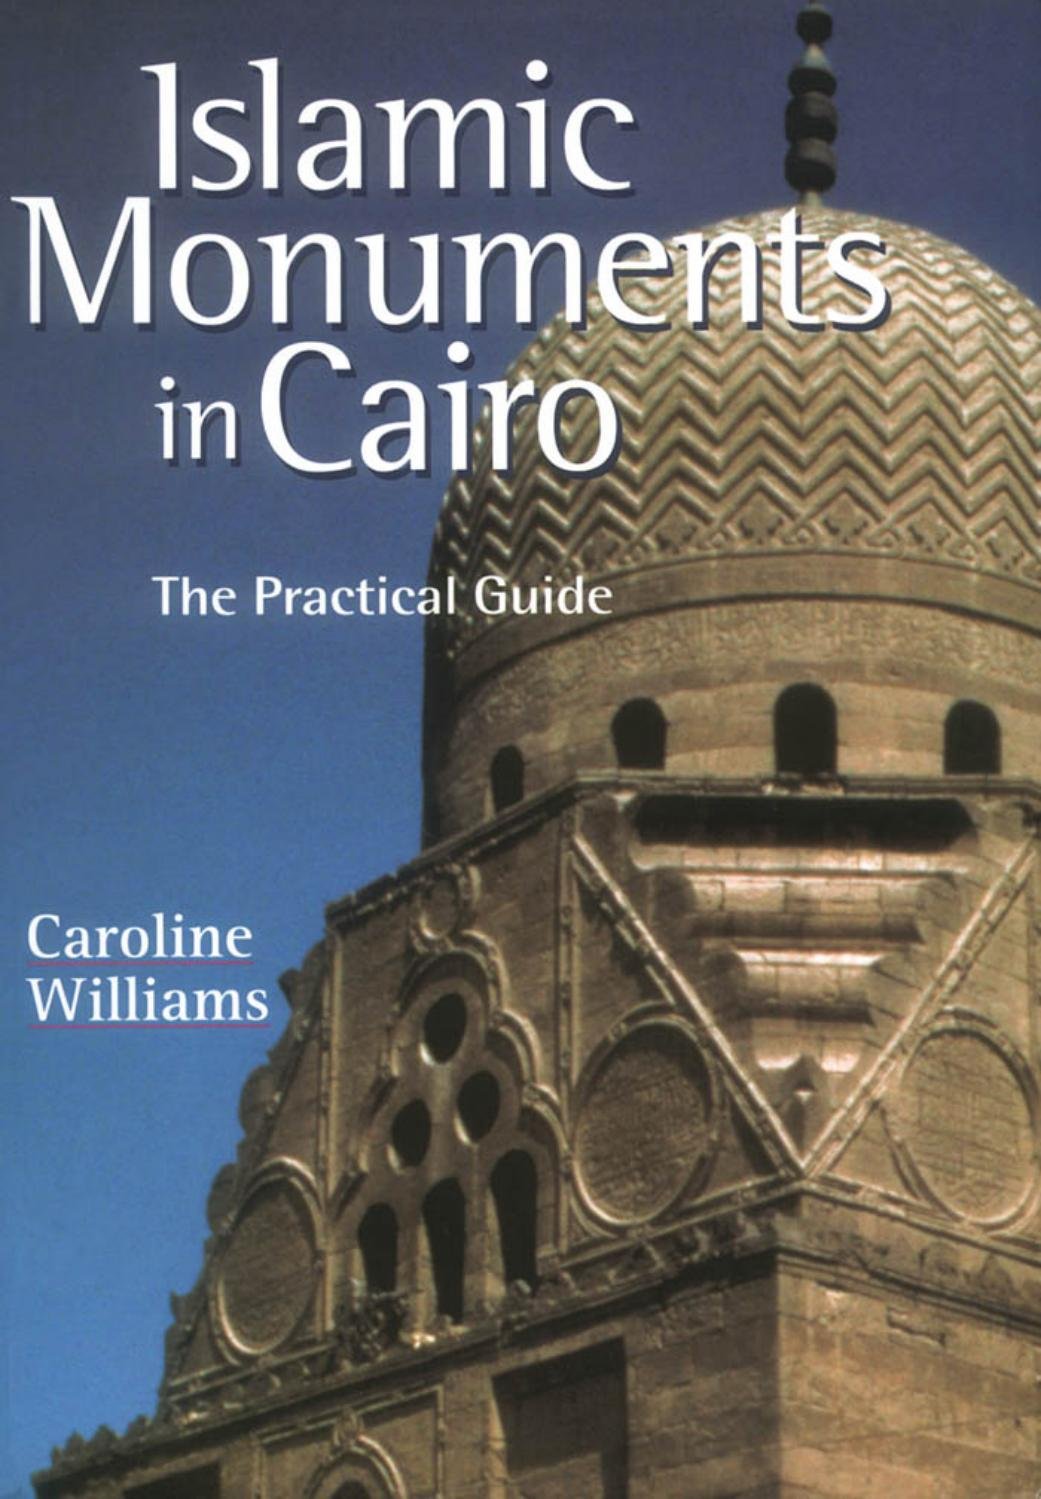 4cfd85dbd4 Islamic monuments in cairo by RU3006SLAN - issuu